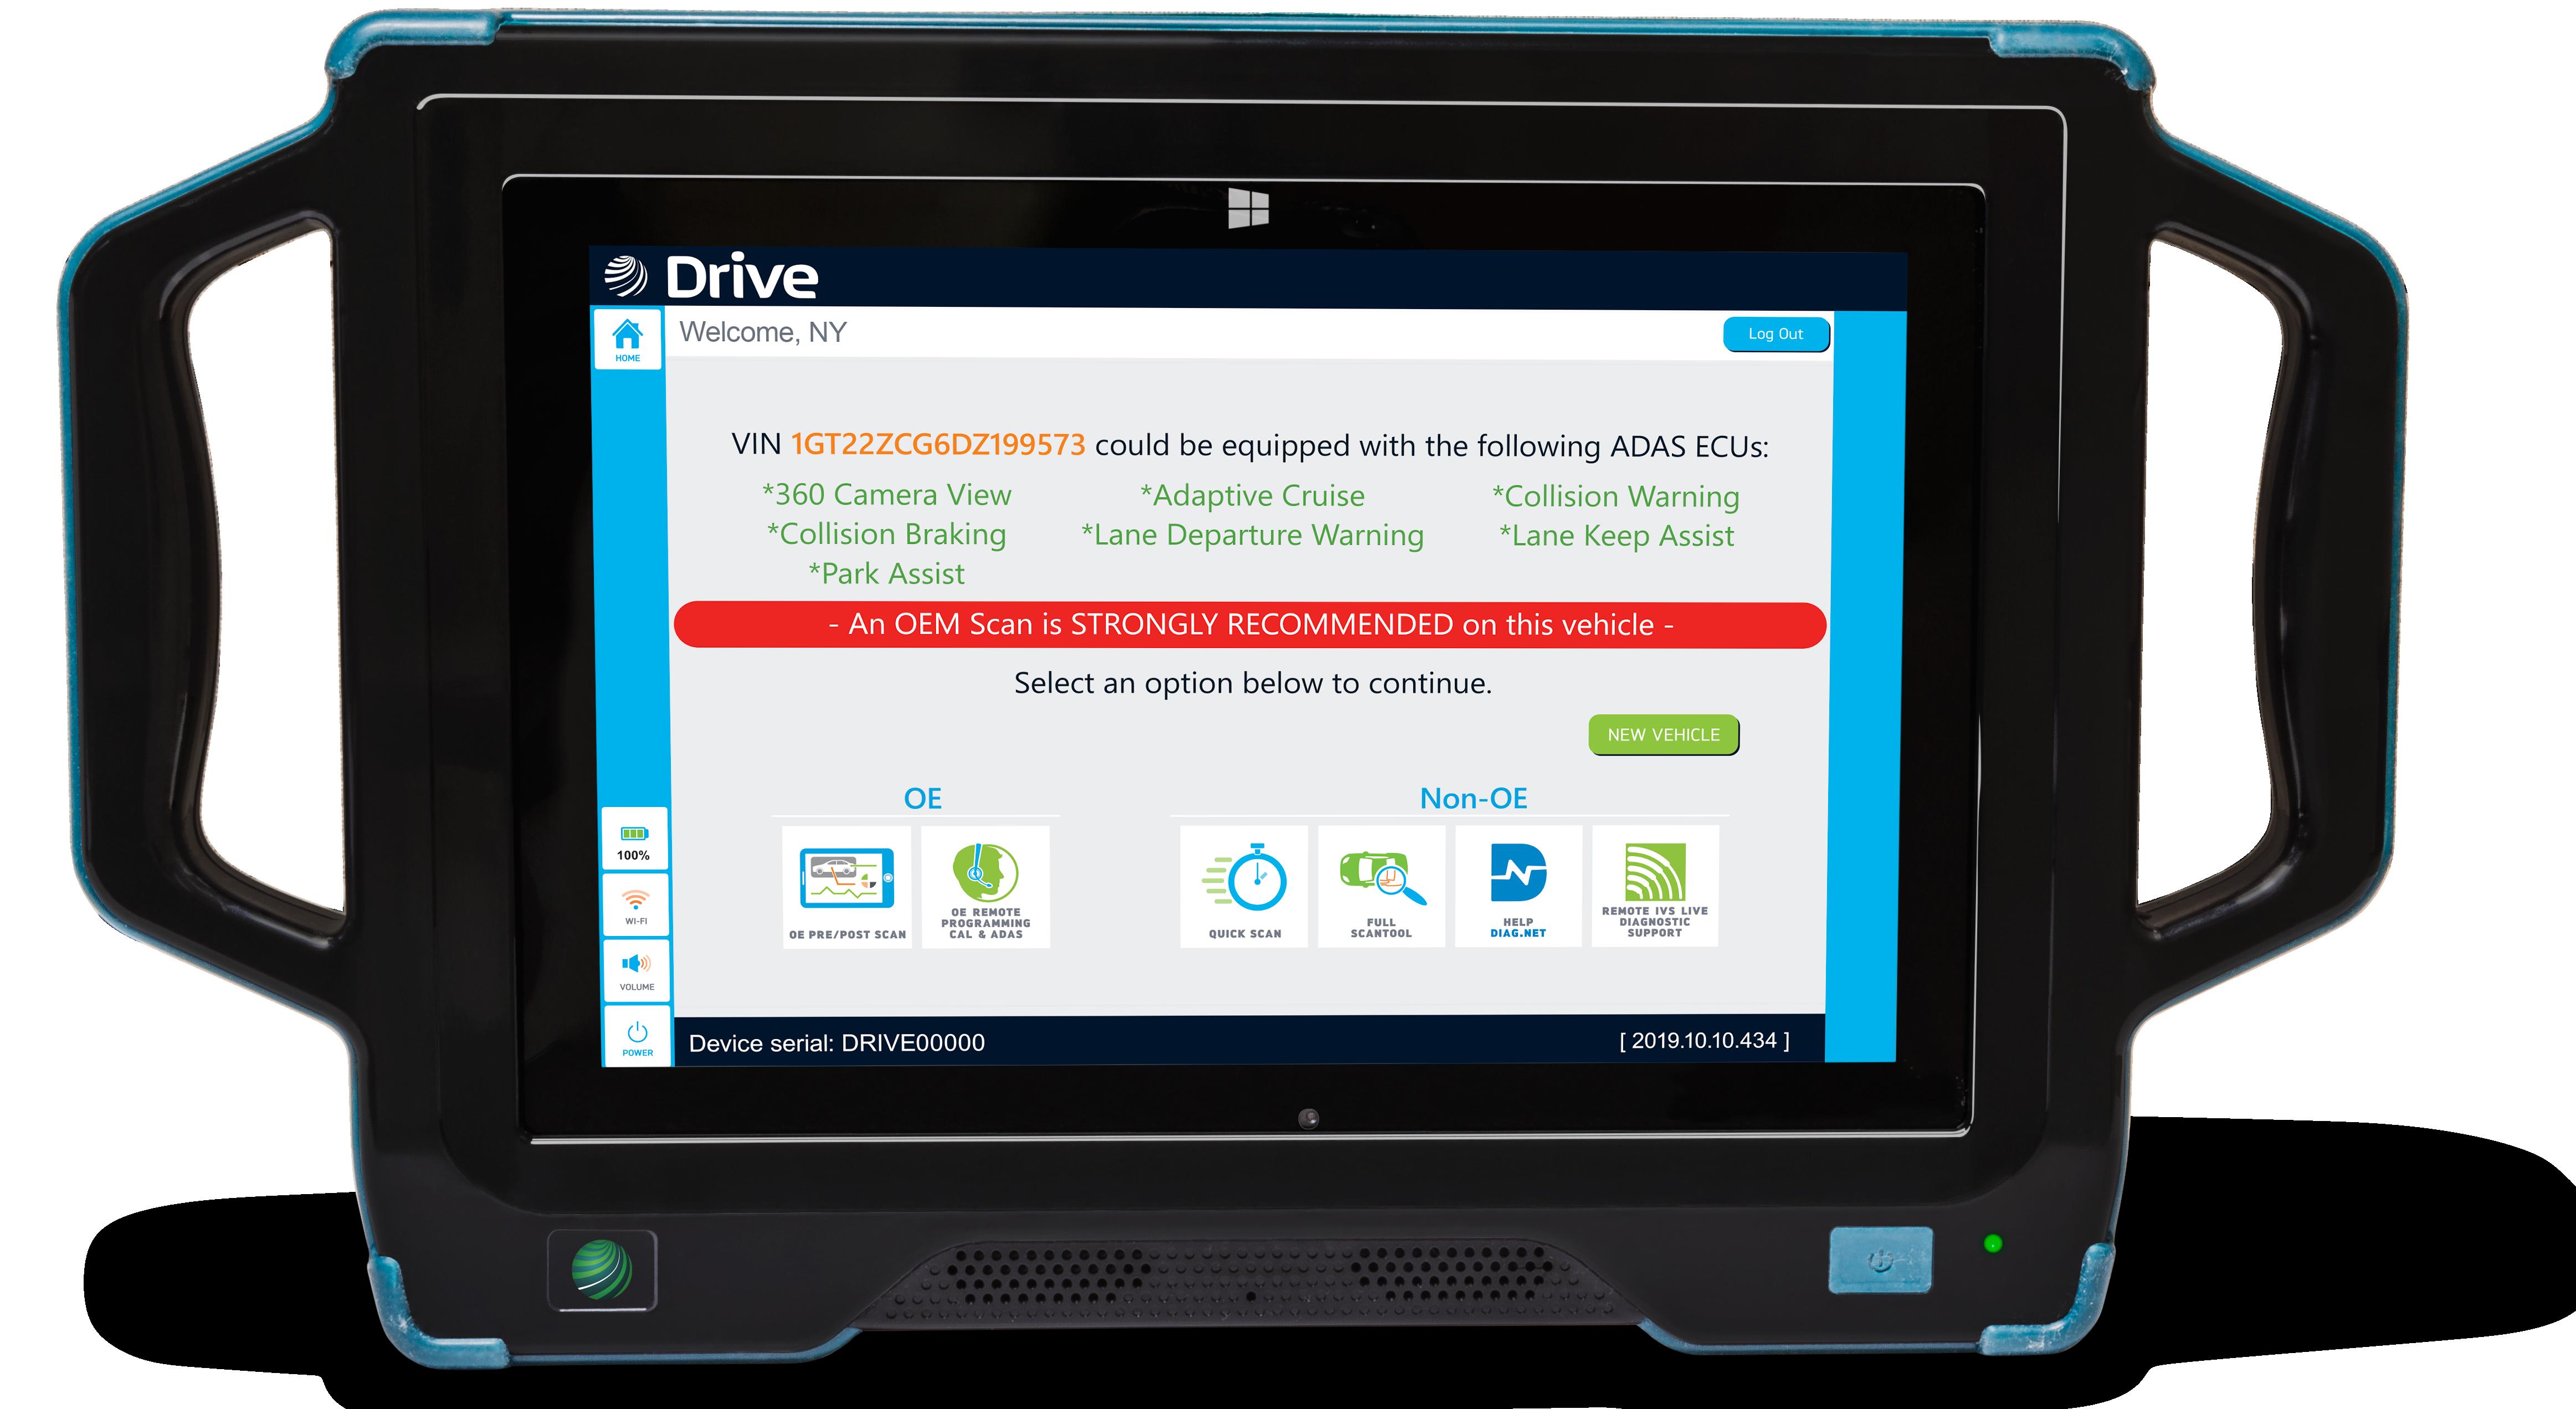 Drivecrash Adas Detect